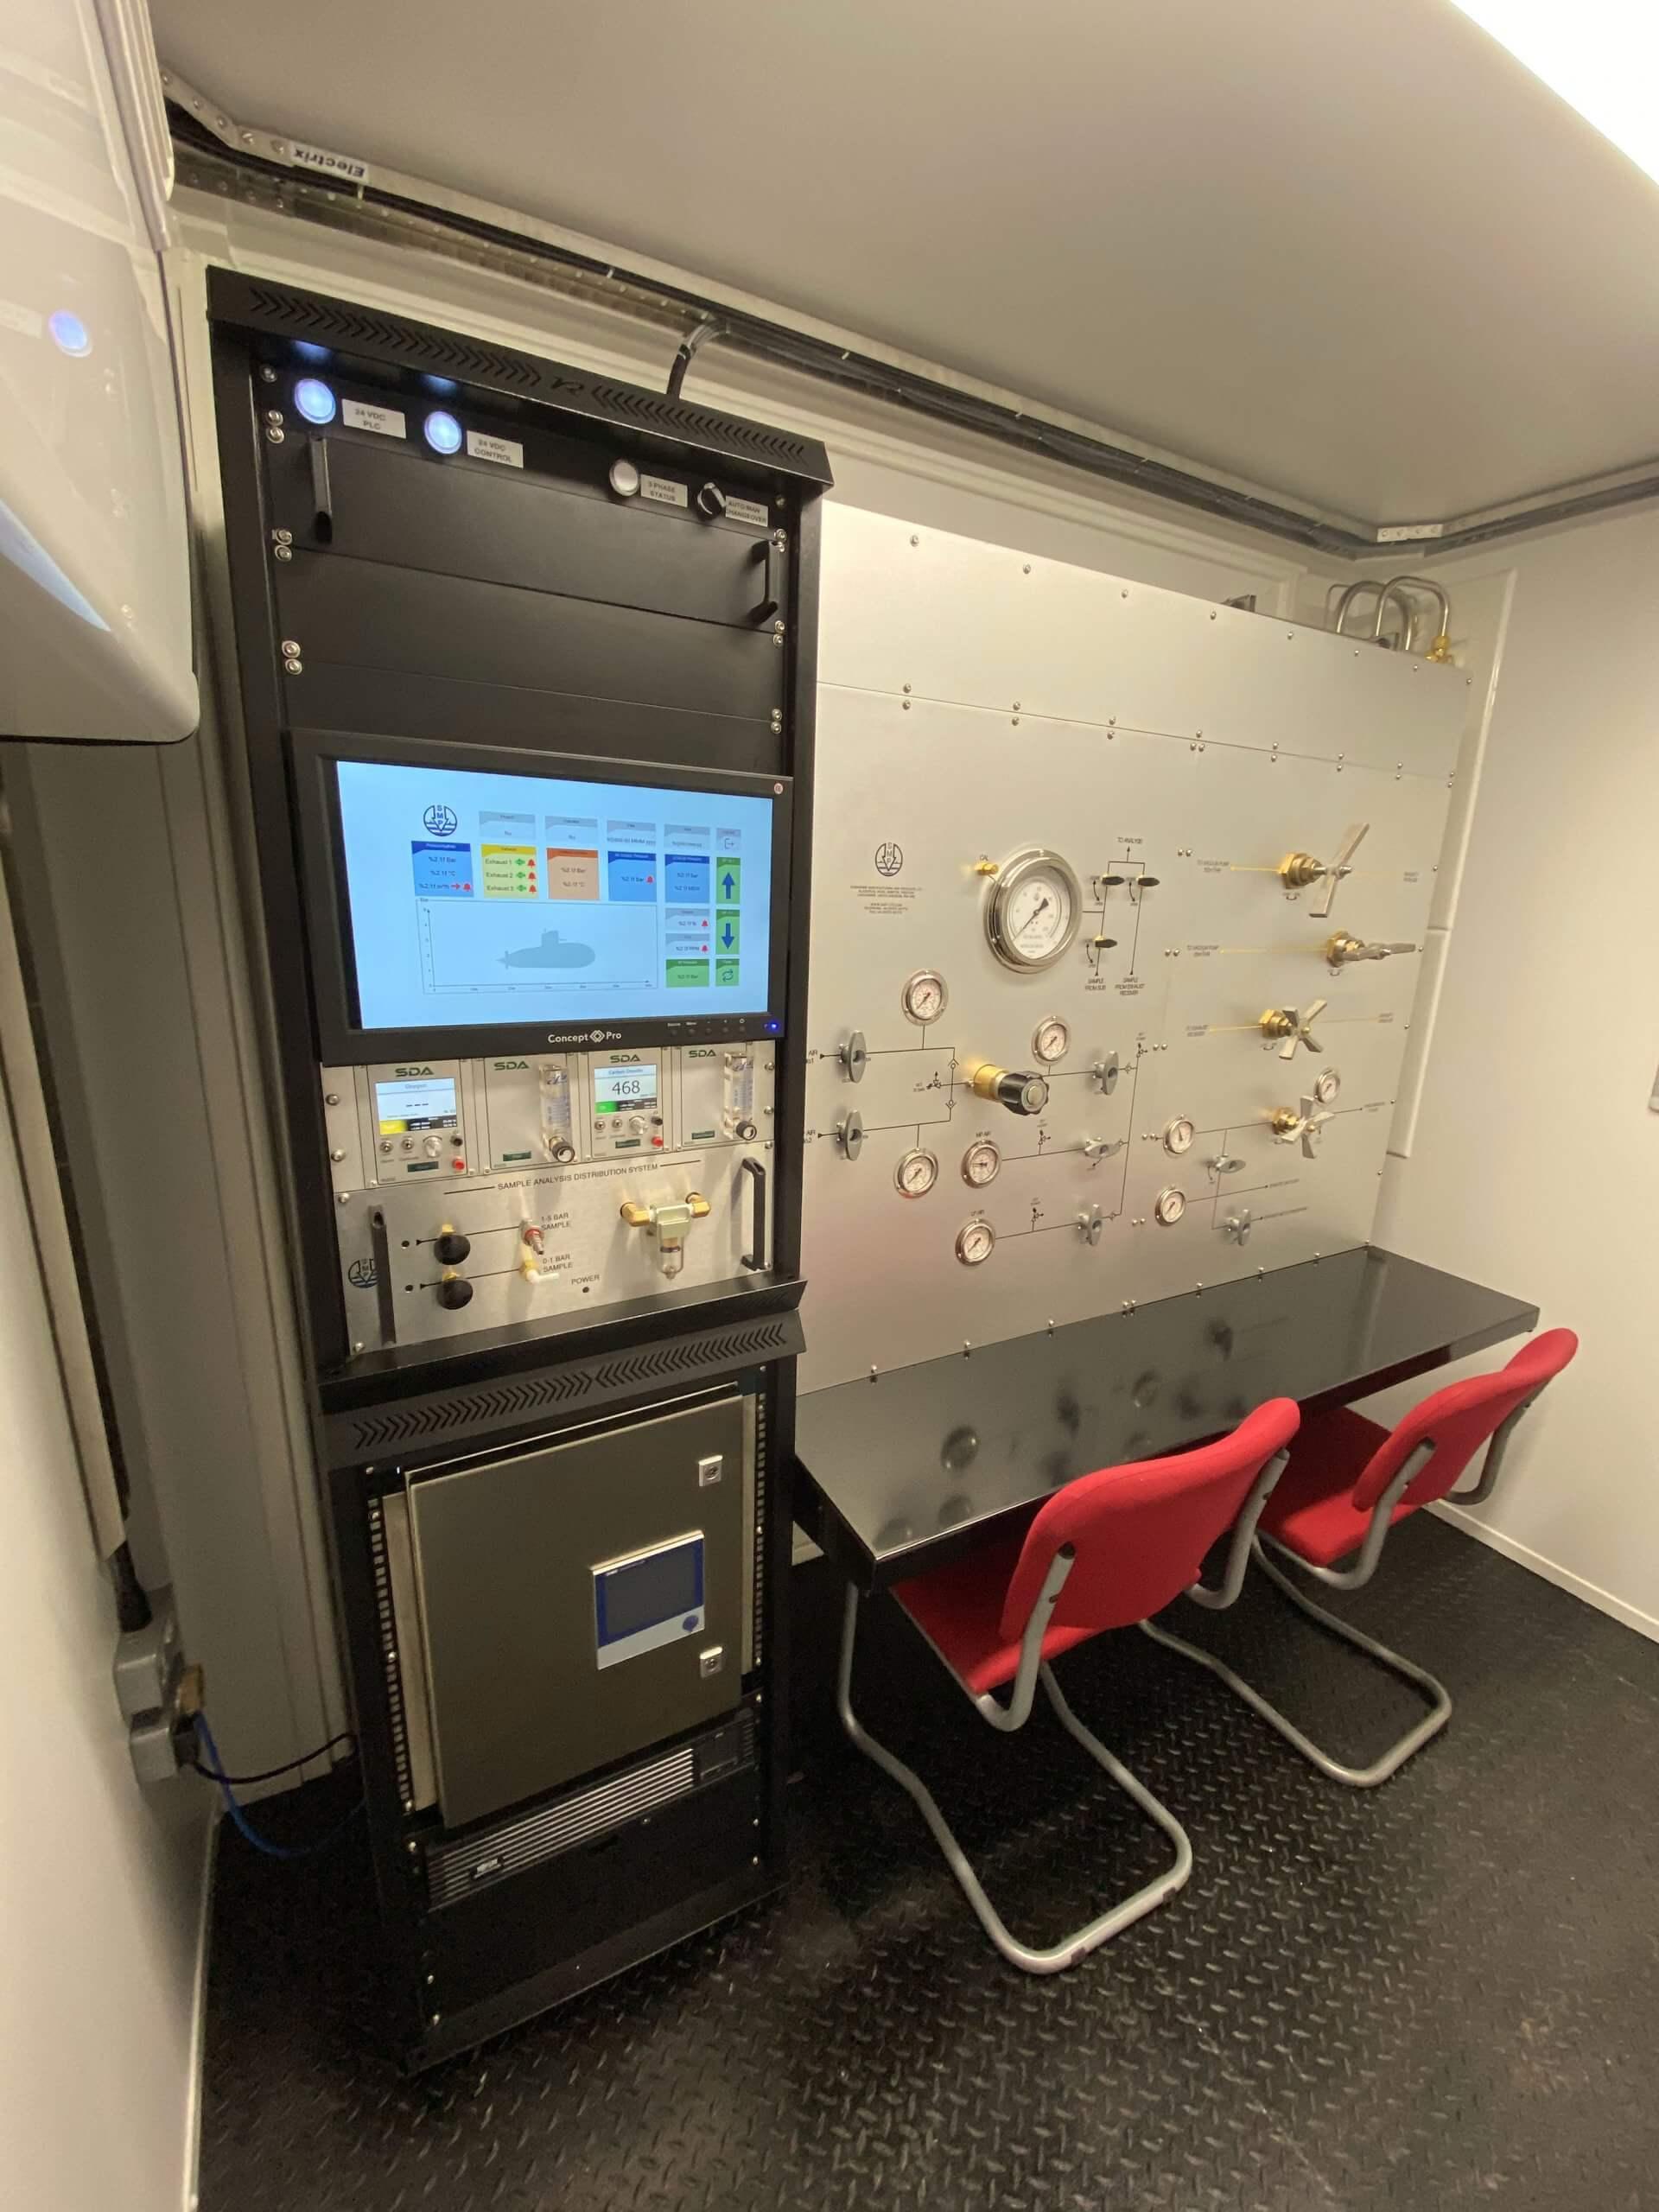 Control panel of Submarine rescue system